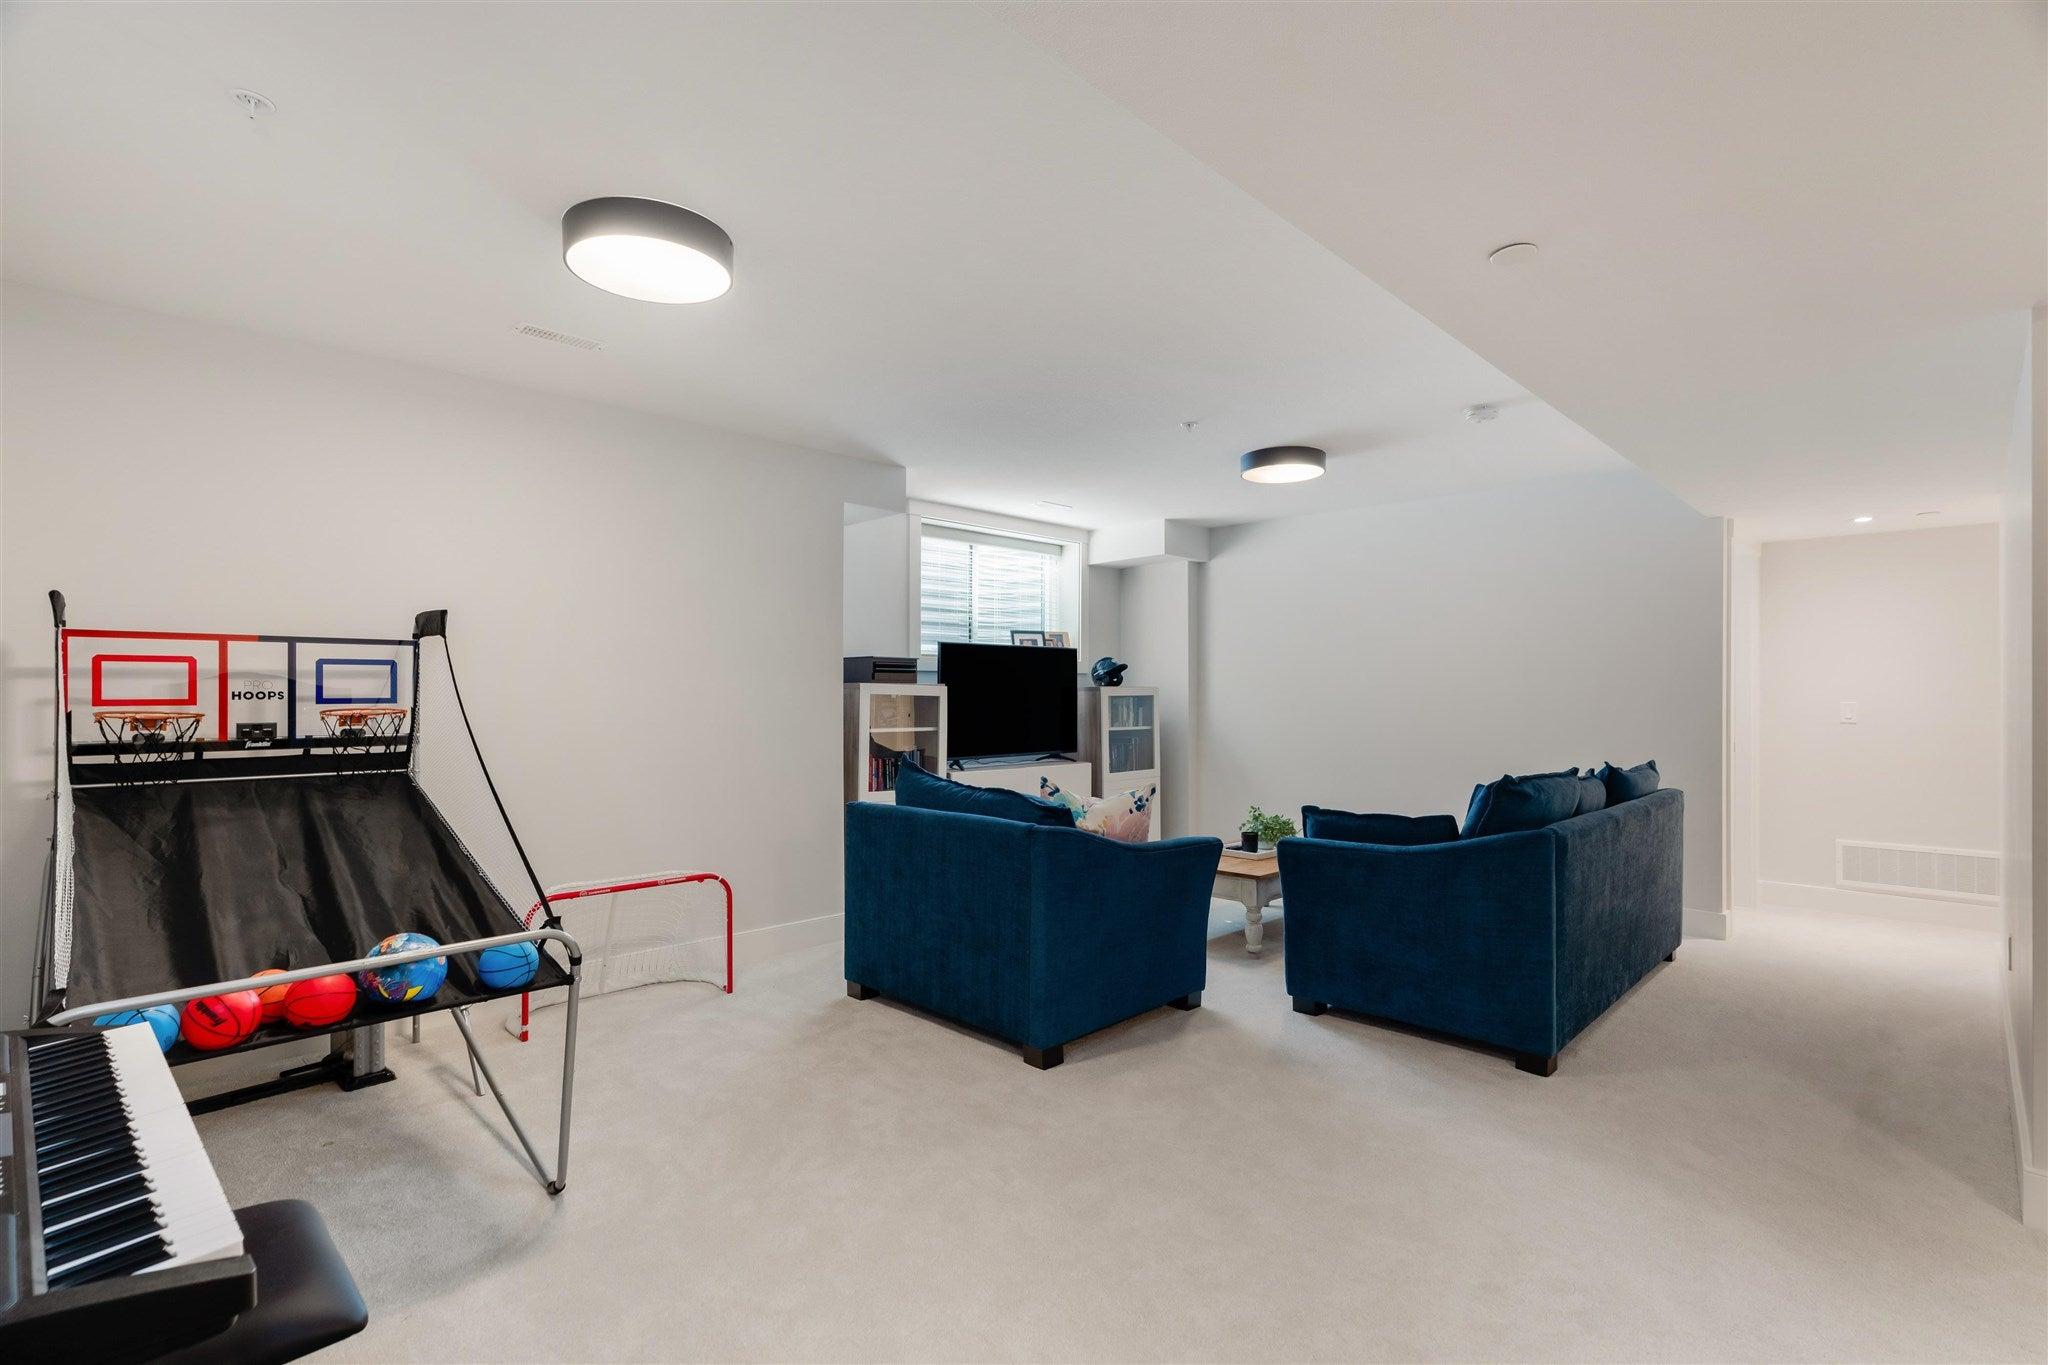 40 21858 47B AVENUE - Murrayville Townhouse for sale, 4 Bedrooms (R2603956) - #26